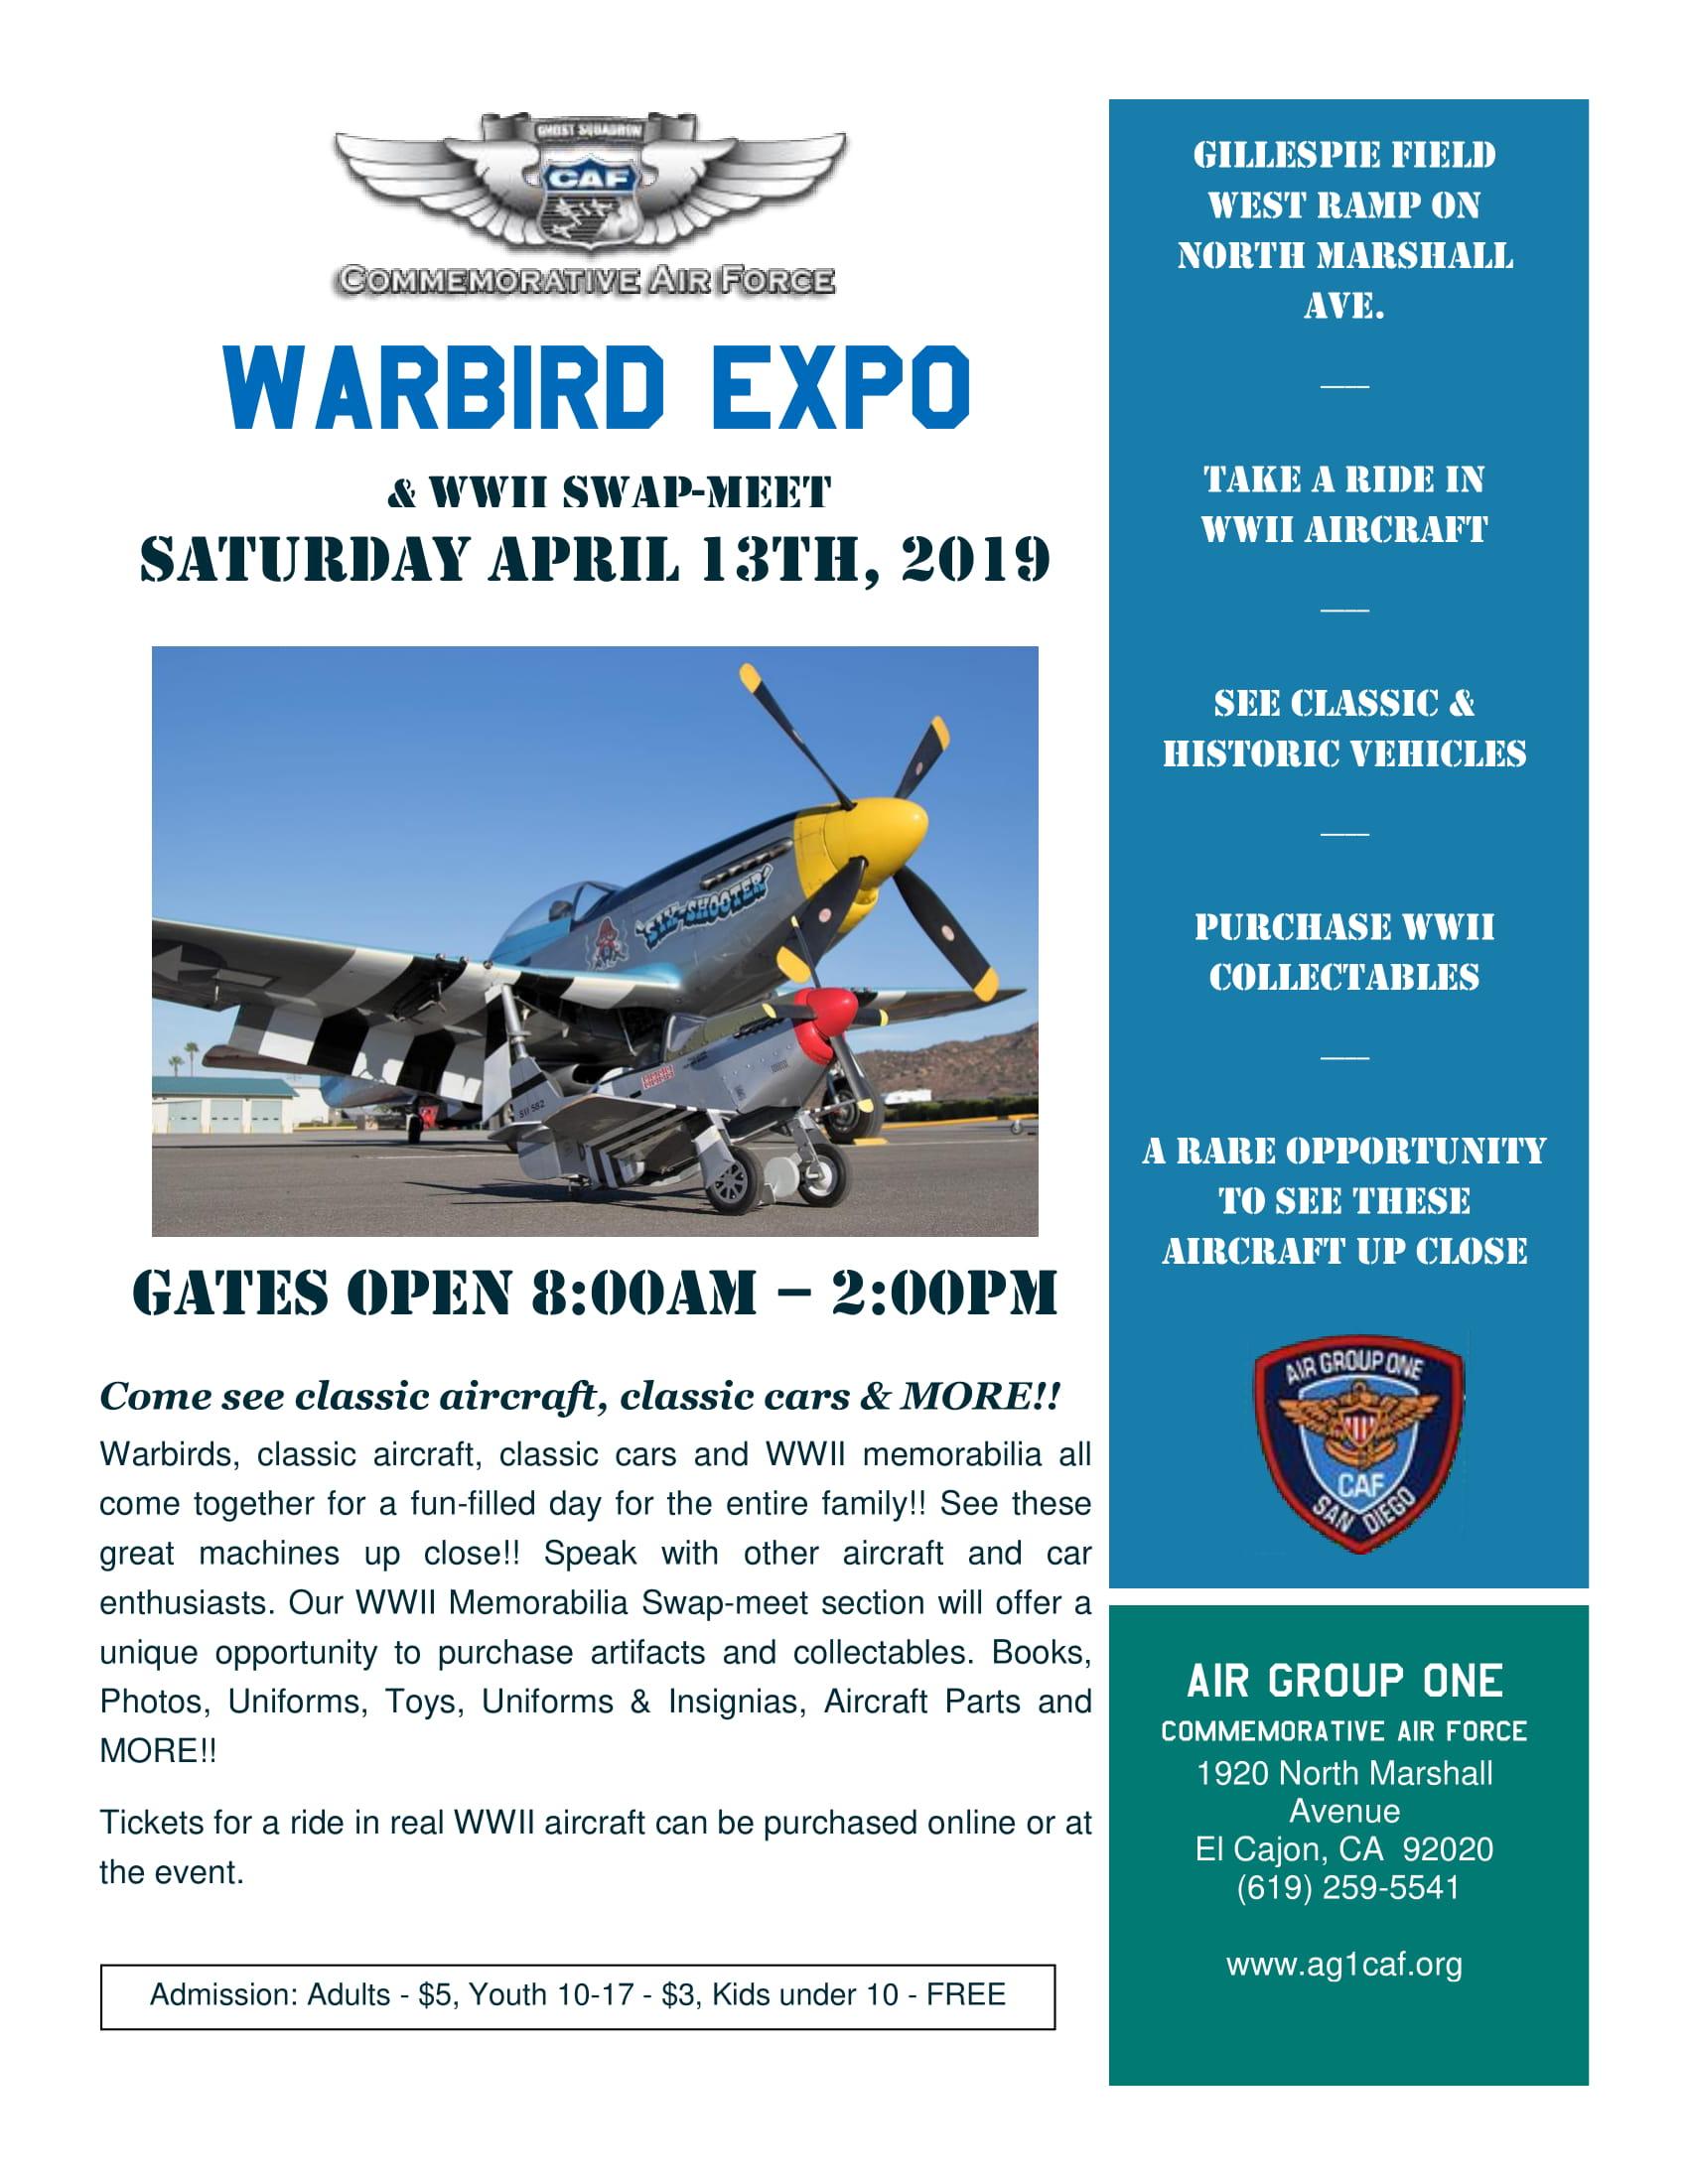 WB Expo 2019 Flyer 2-1.jpg